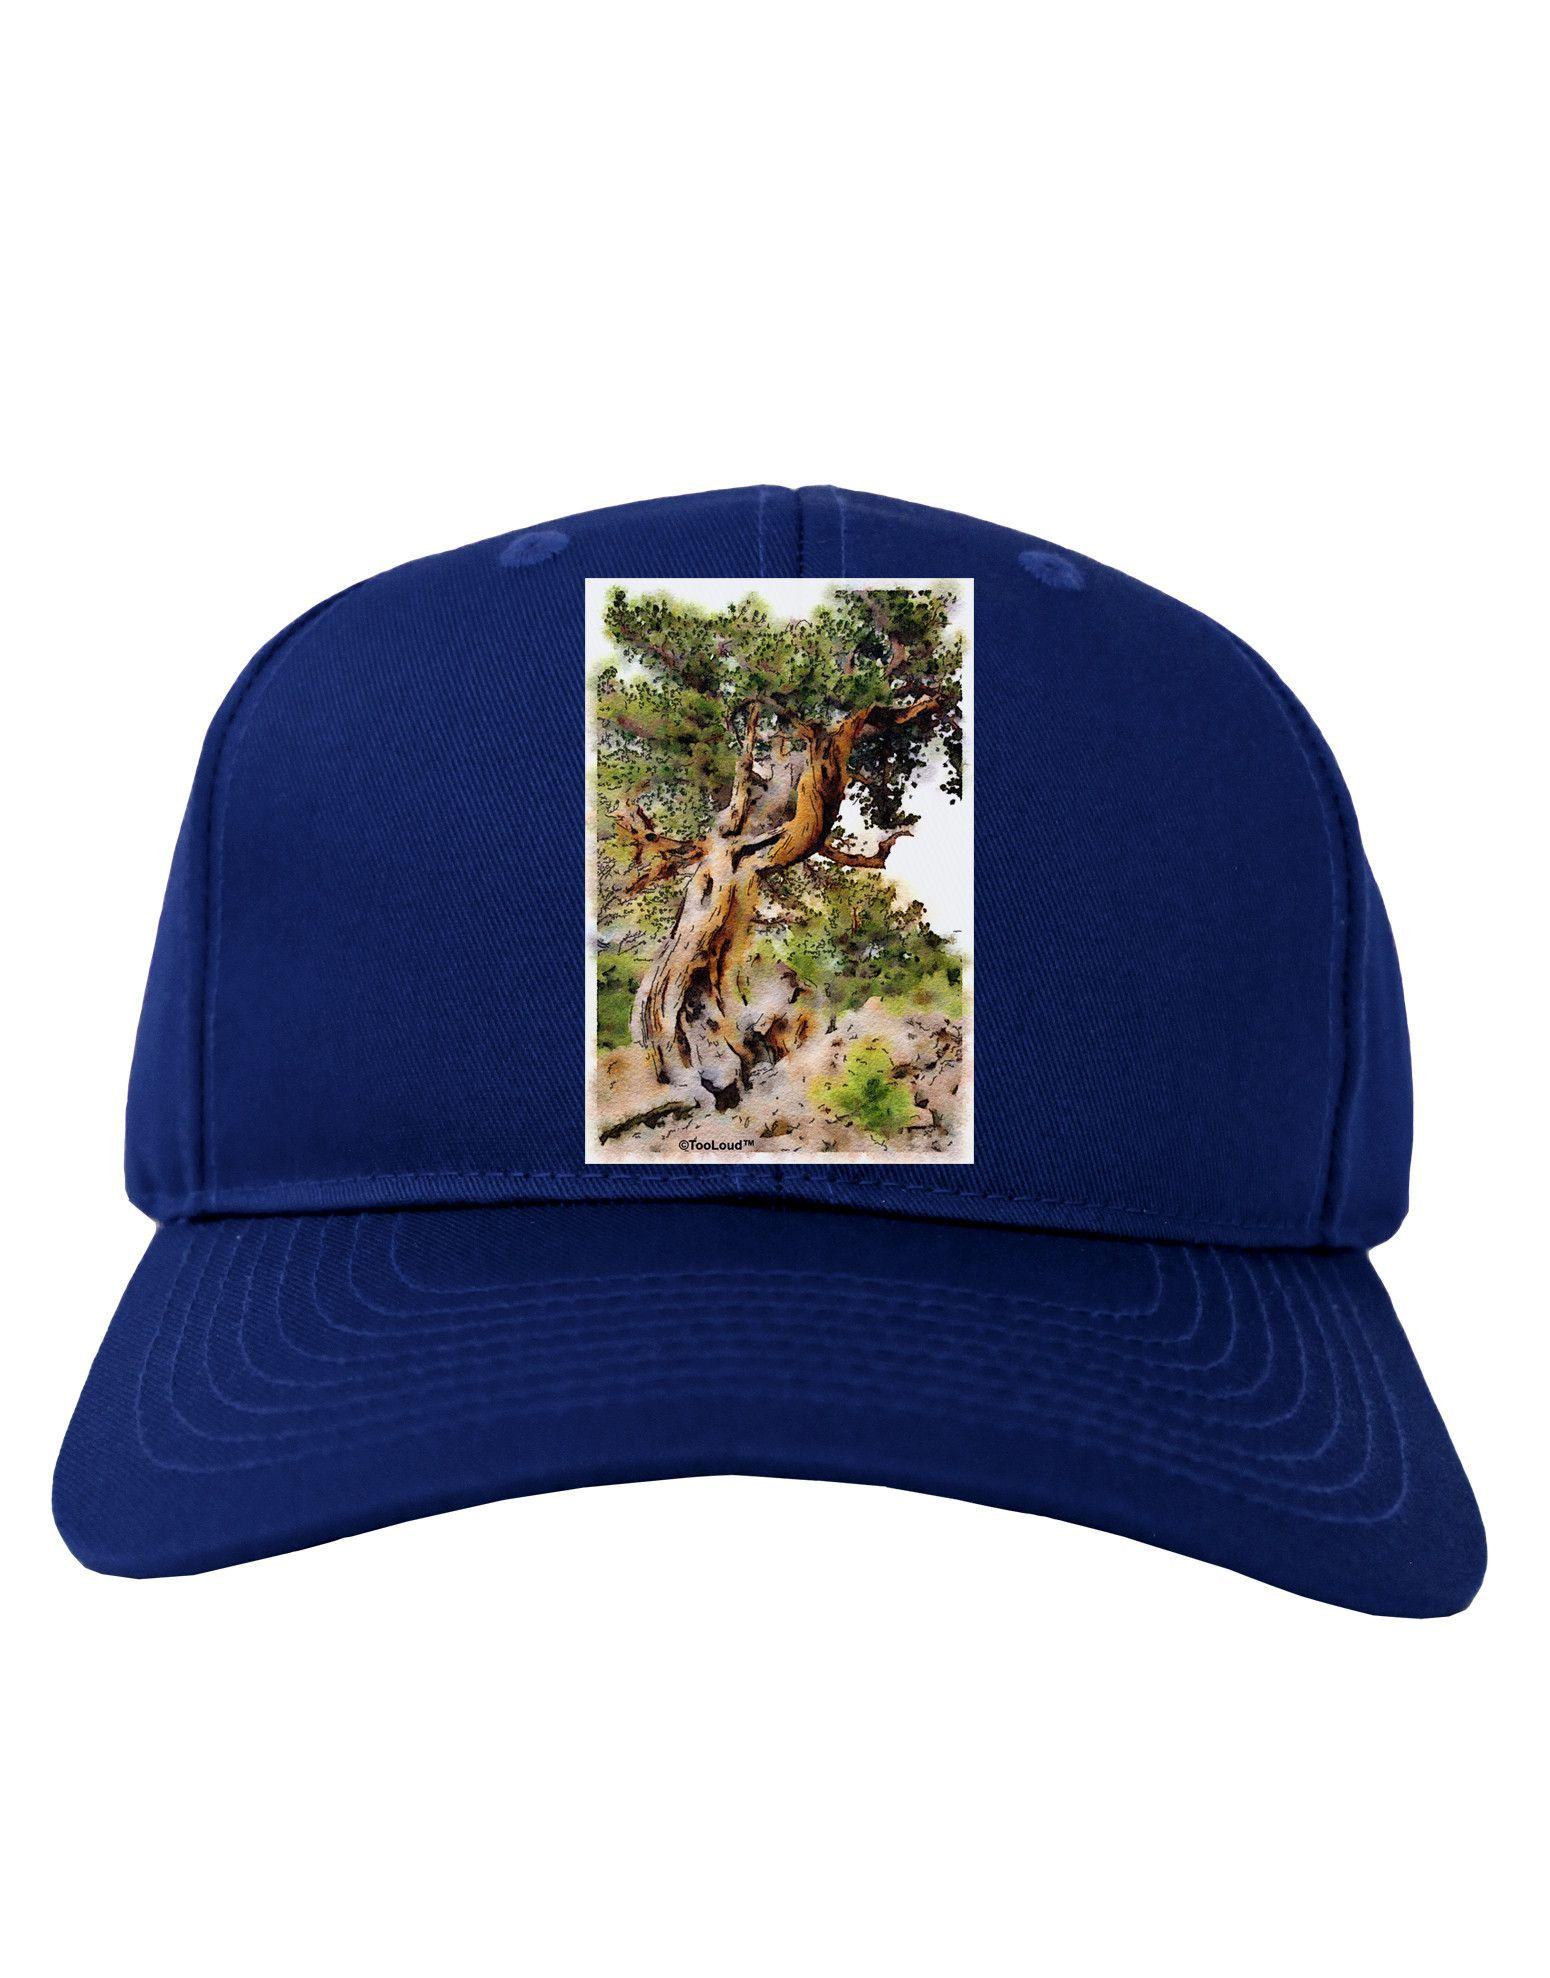 TooLoud Bristlecone Pines Adult Dark Baseball Cap Hat  1c6dc8cfe456